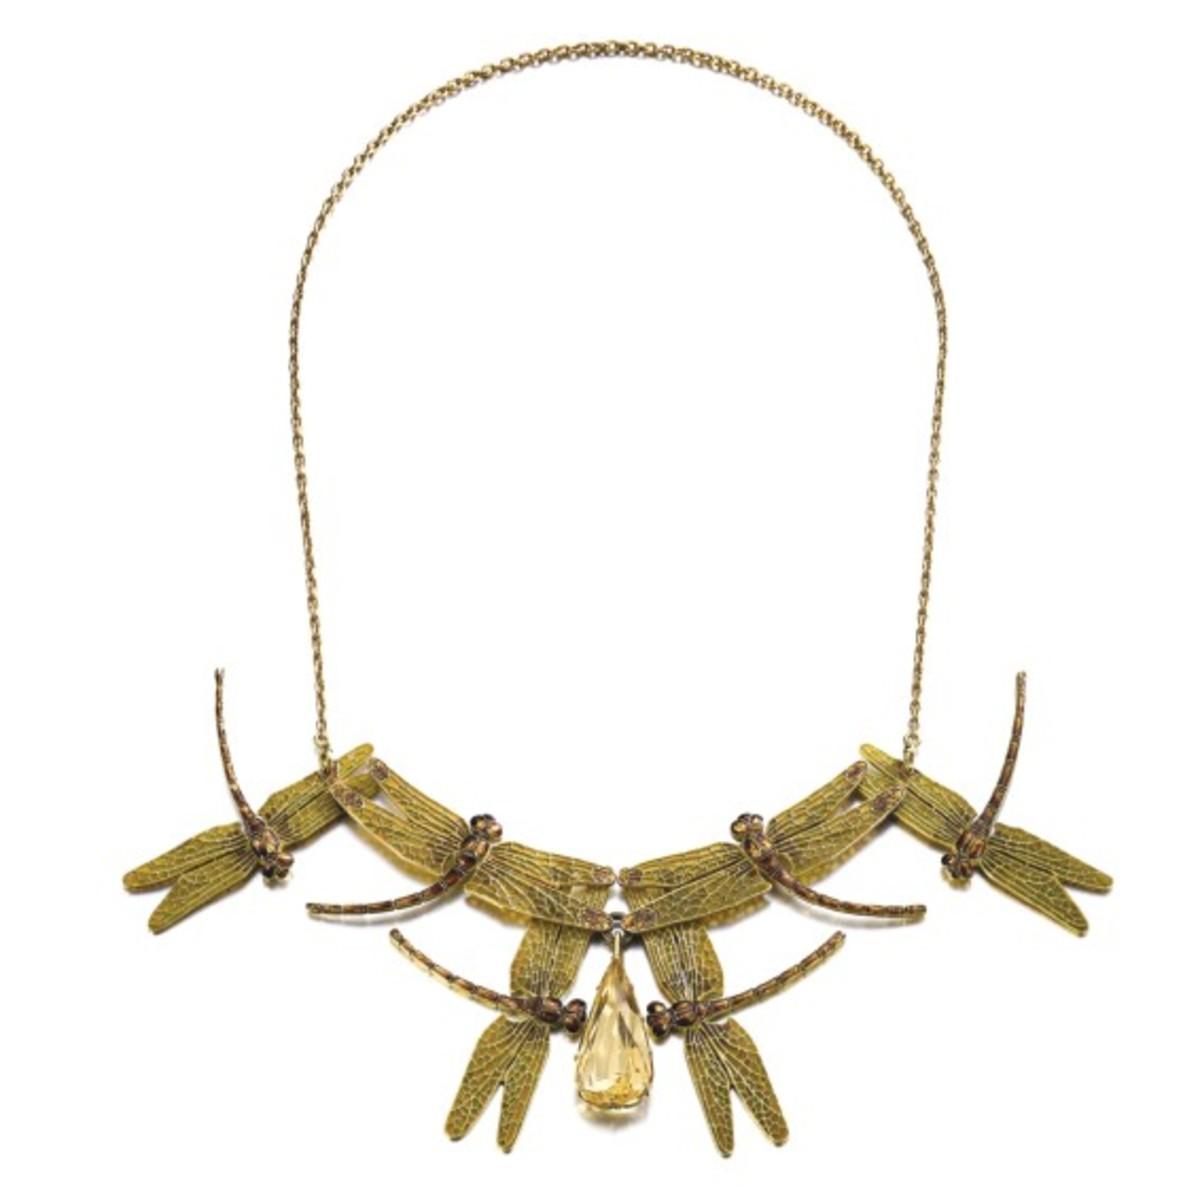 Lalique gold, enamel and citrine necklace/hair comb combination, c. 1900; $262,269.